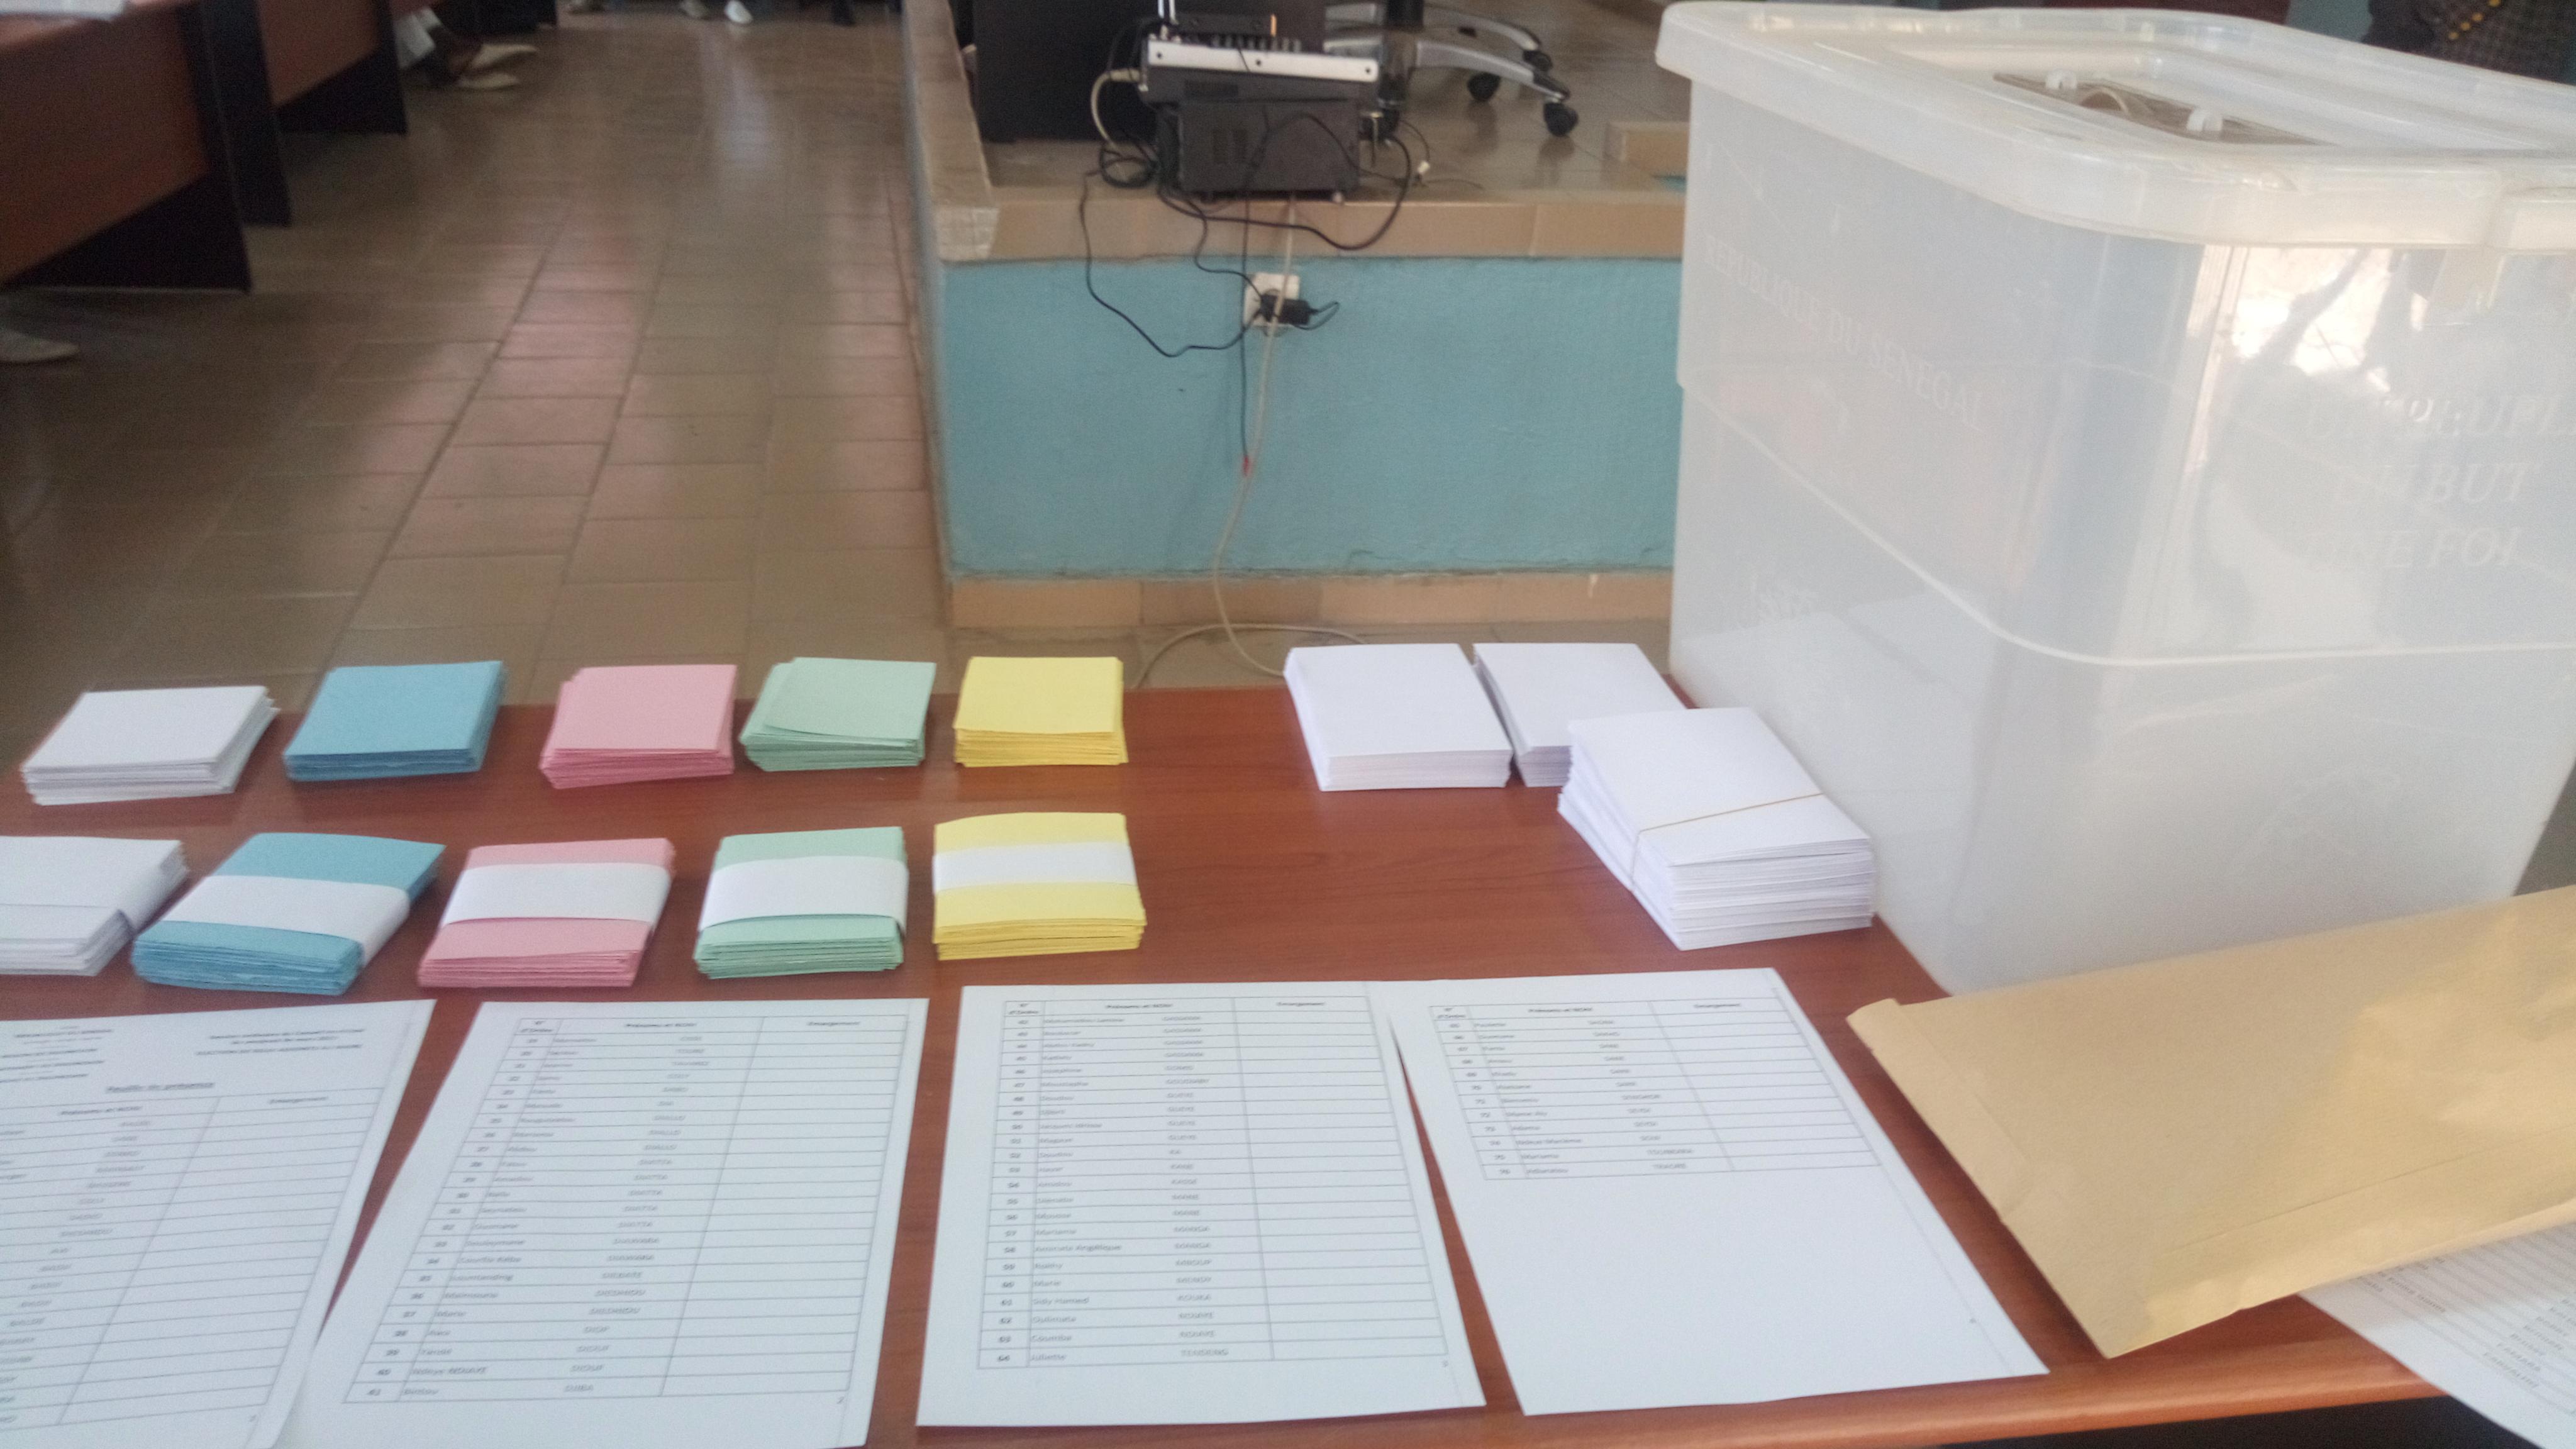 Bureau Municipal de Ziguinchor: Samba Gackou et Mariama Diédhiou remplacés ce vendredi